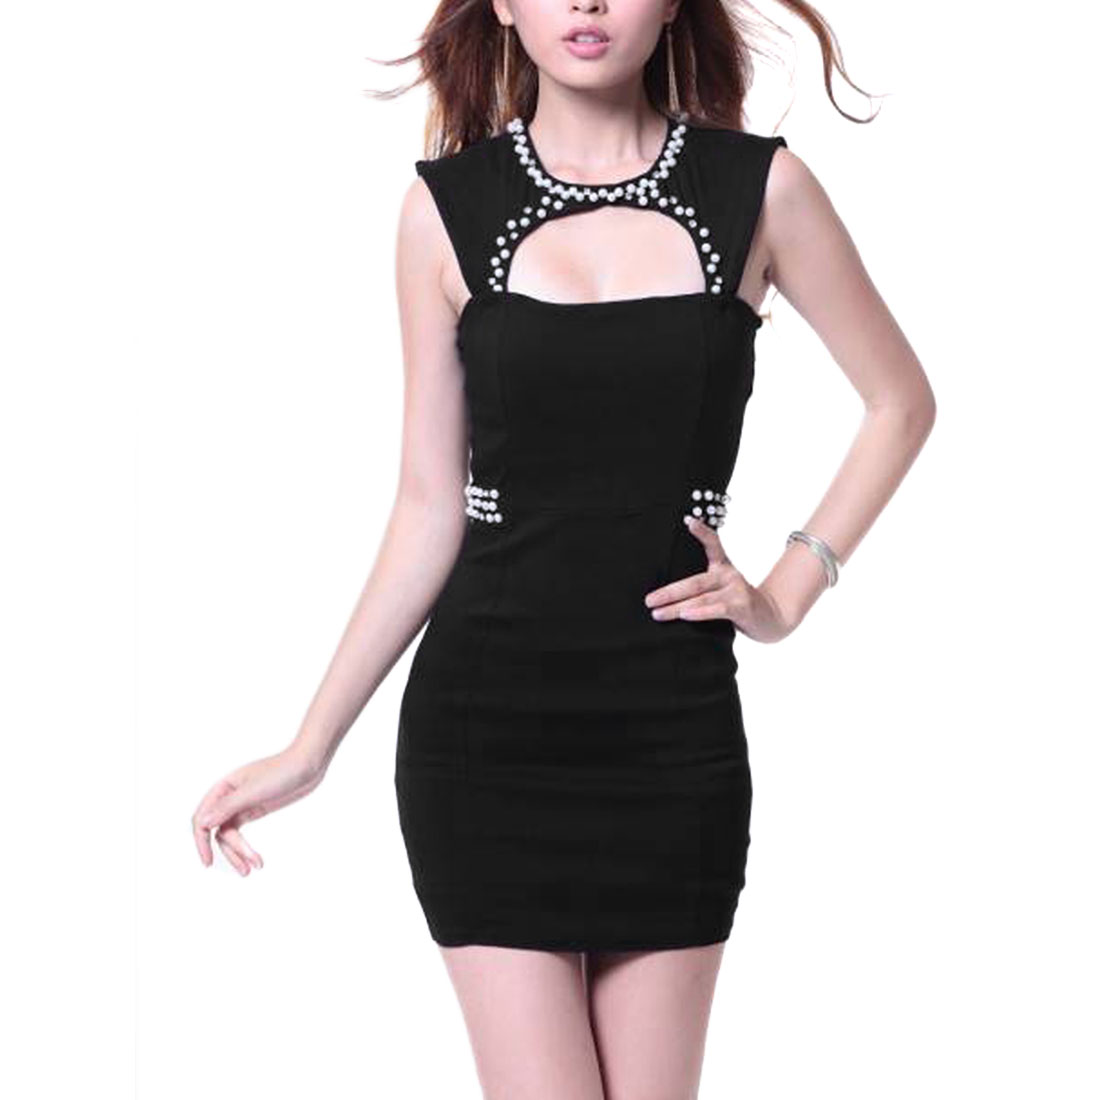 Women Zip Up Sleeveless Beads Detail Dress Black XS